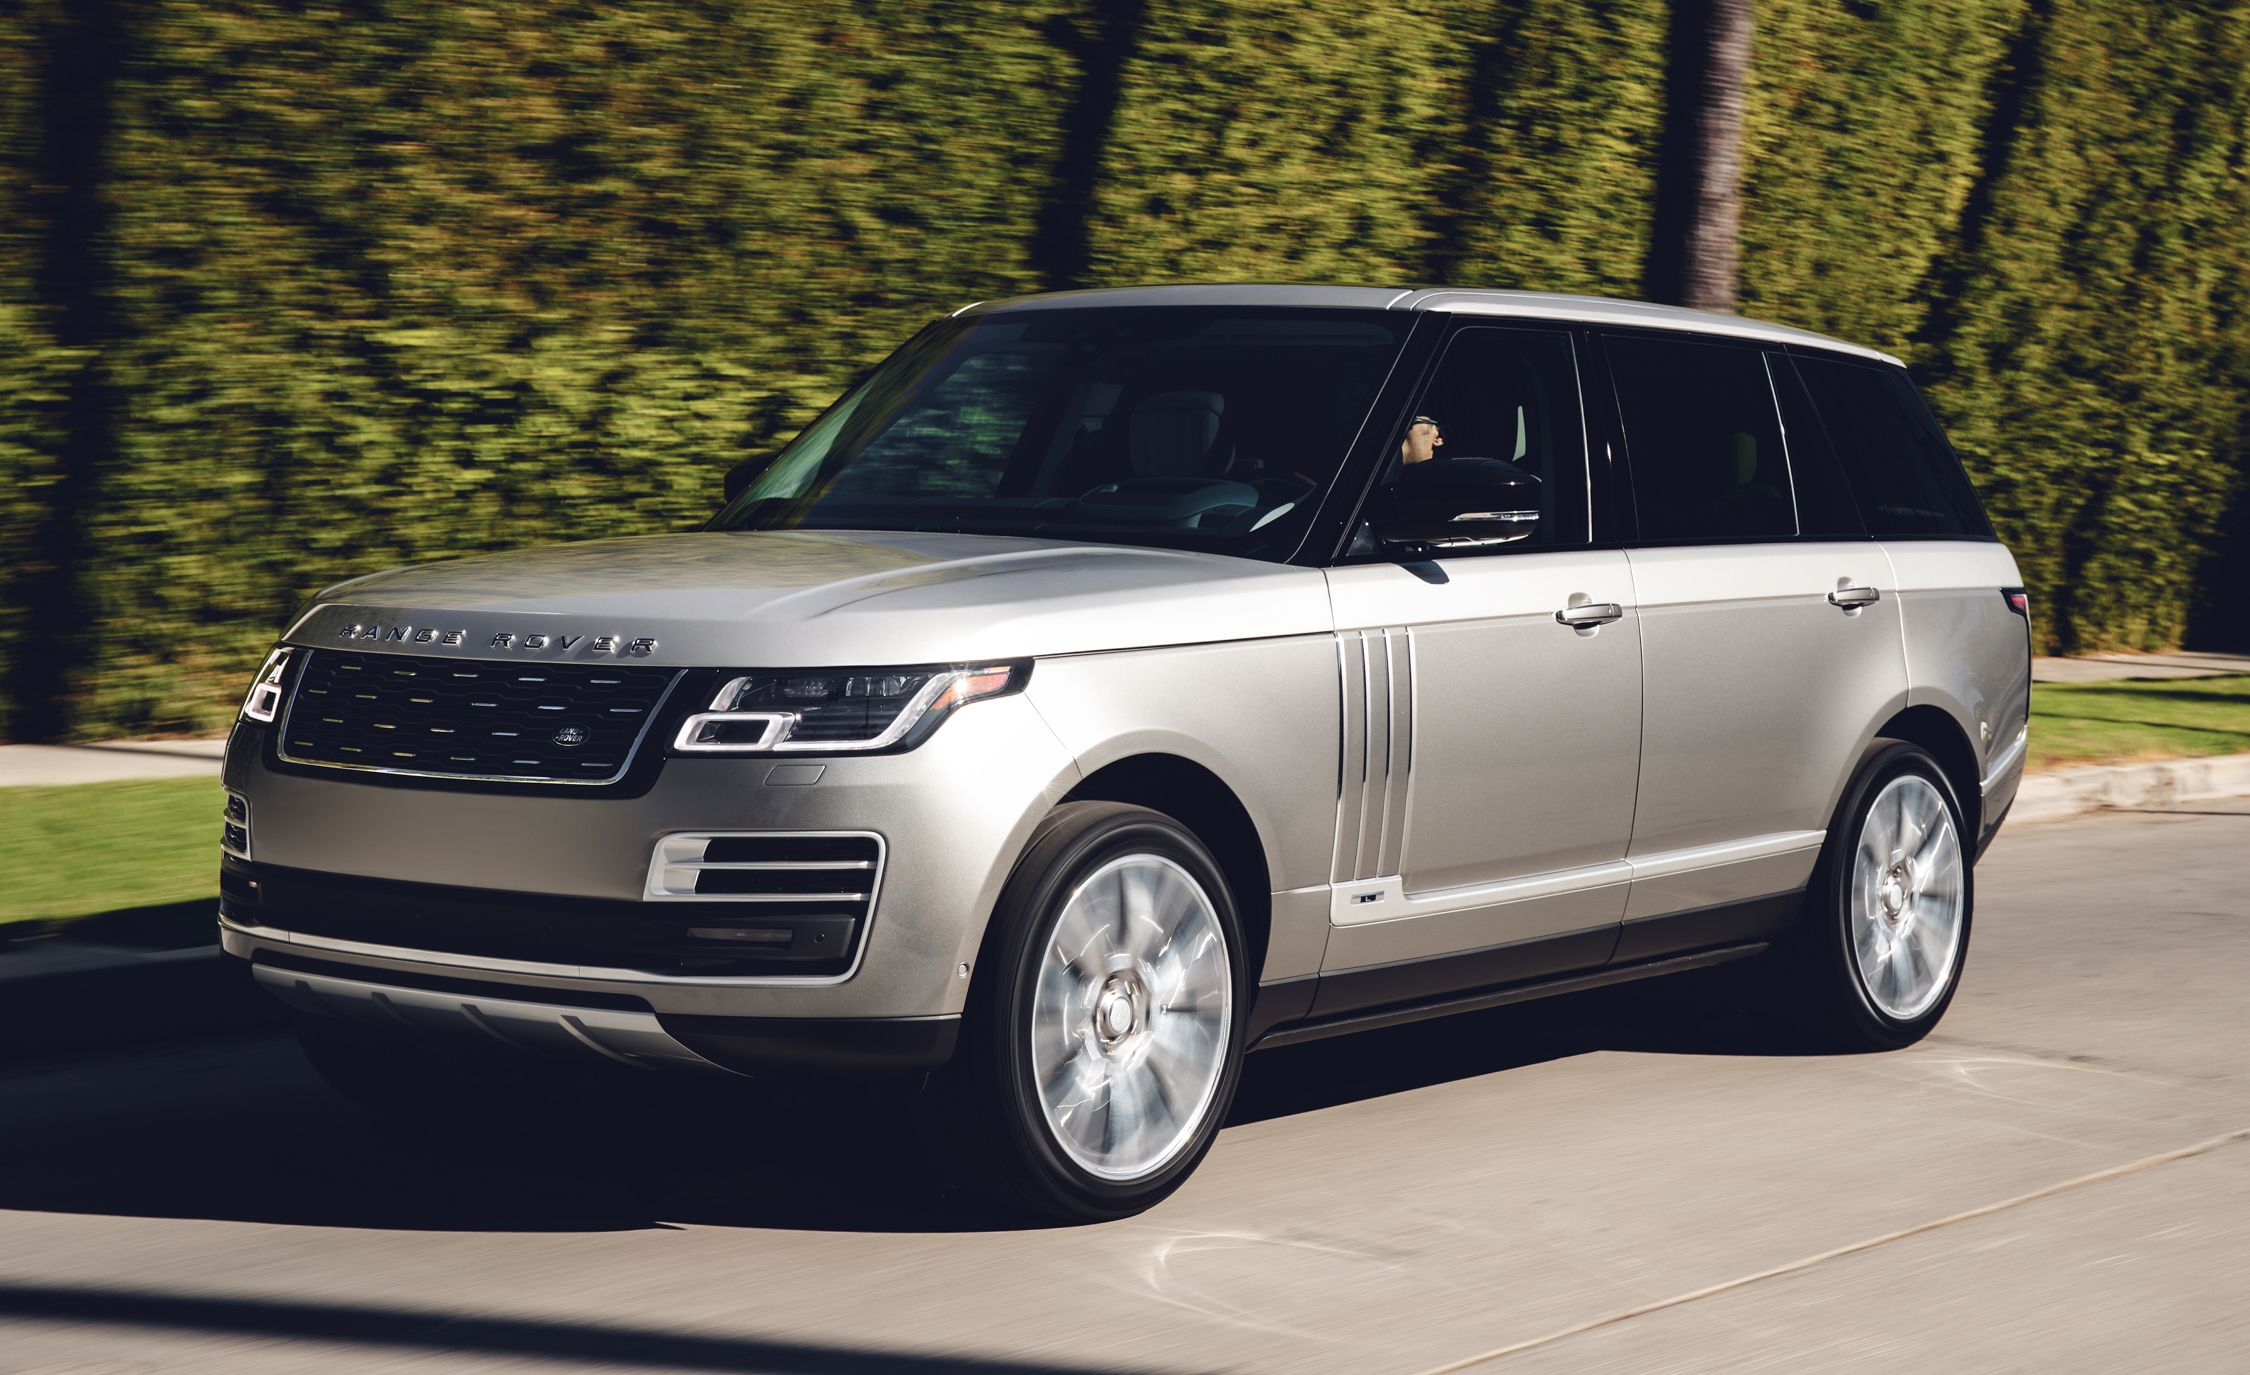 2018 Land Rover Range Rover Gallery